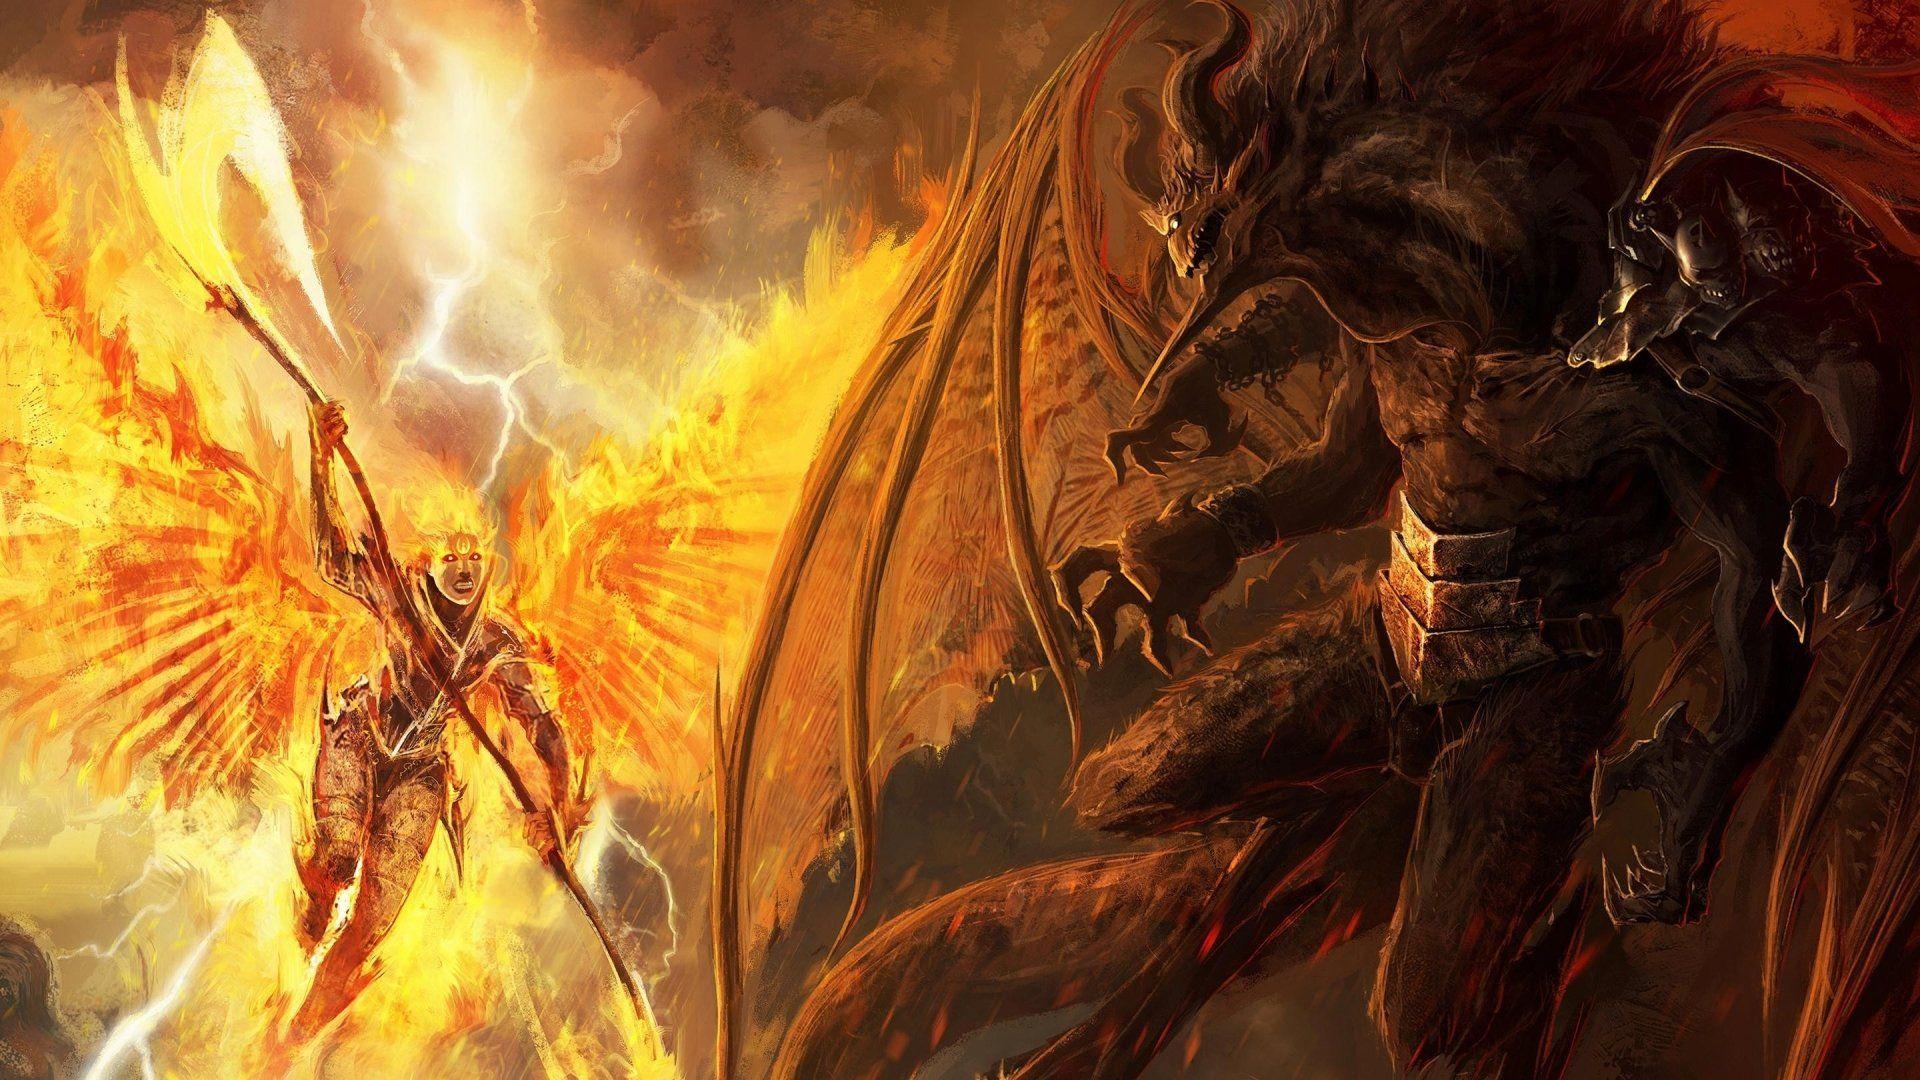 Fantasy Art Battle Fire Demons